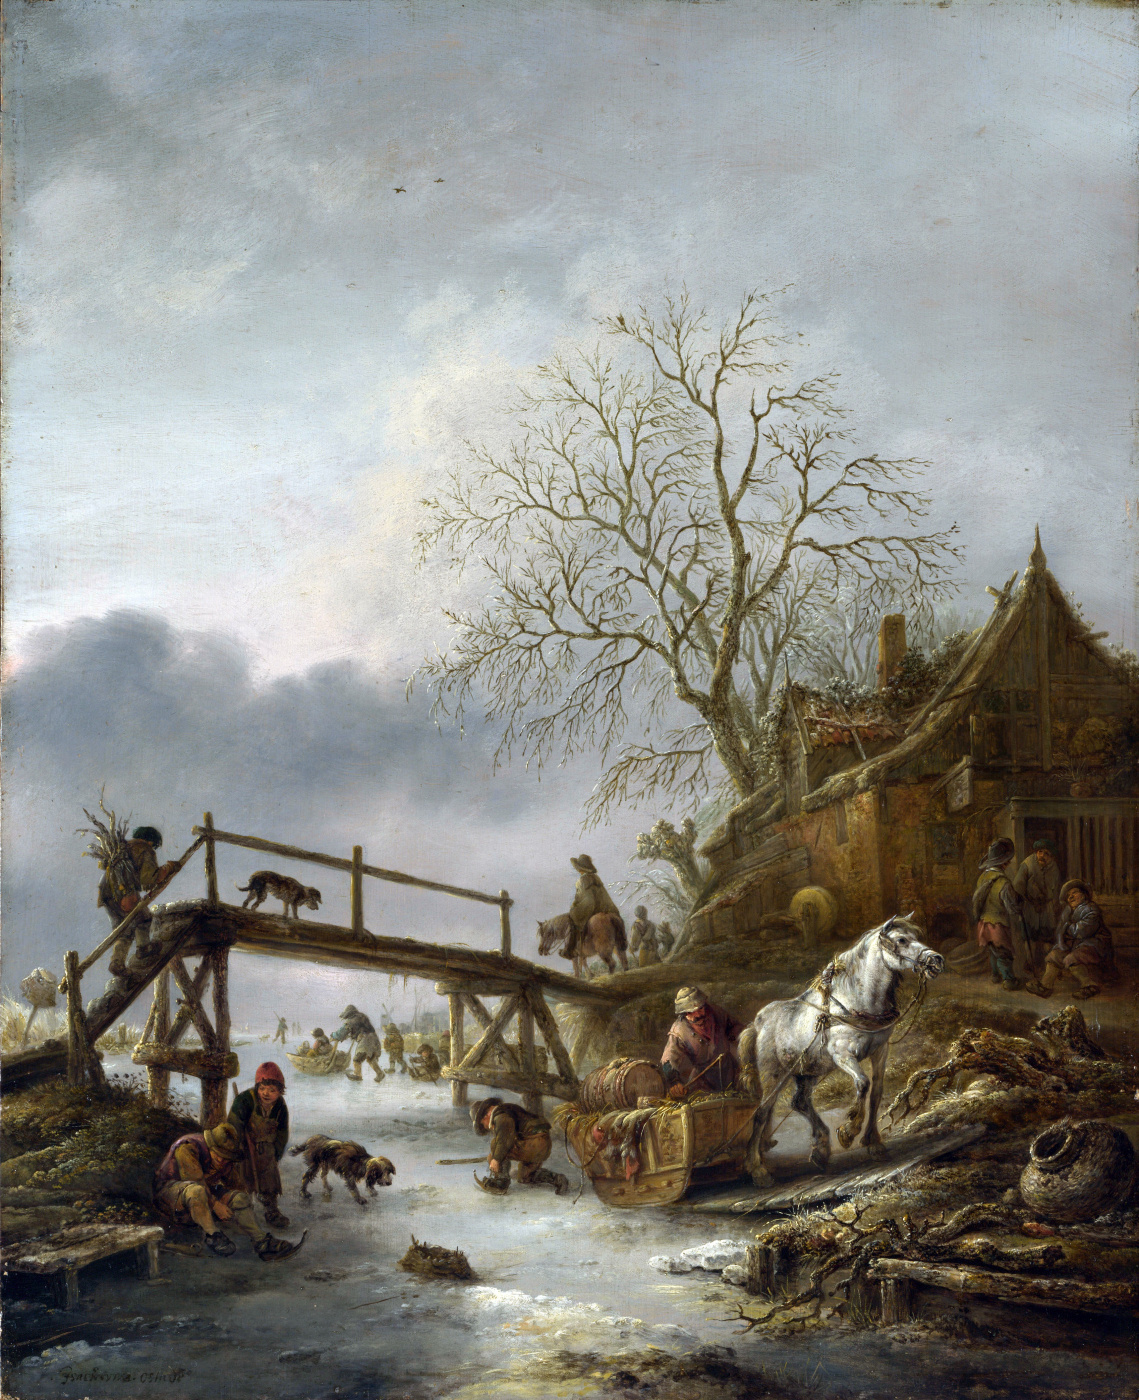 Isaac Jans van Ostade. Tavern on the frozen river